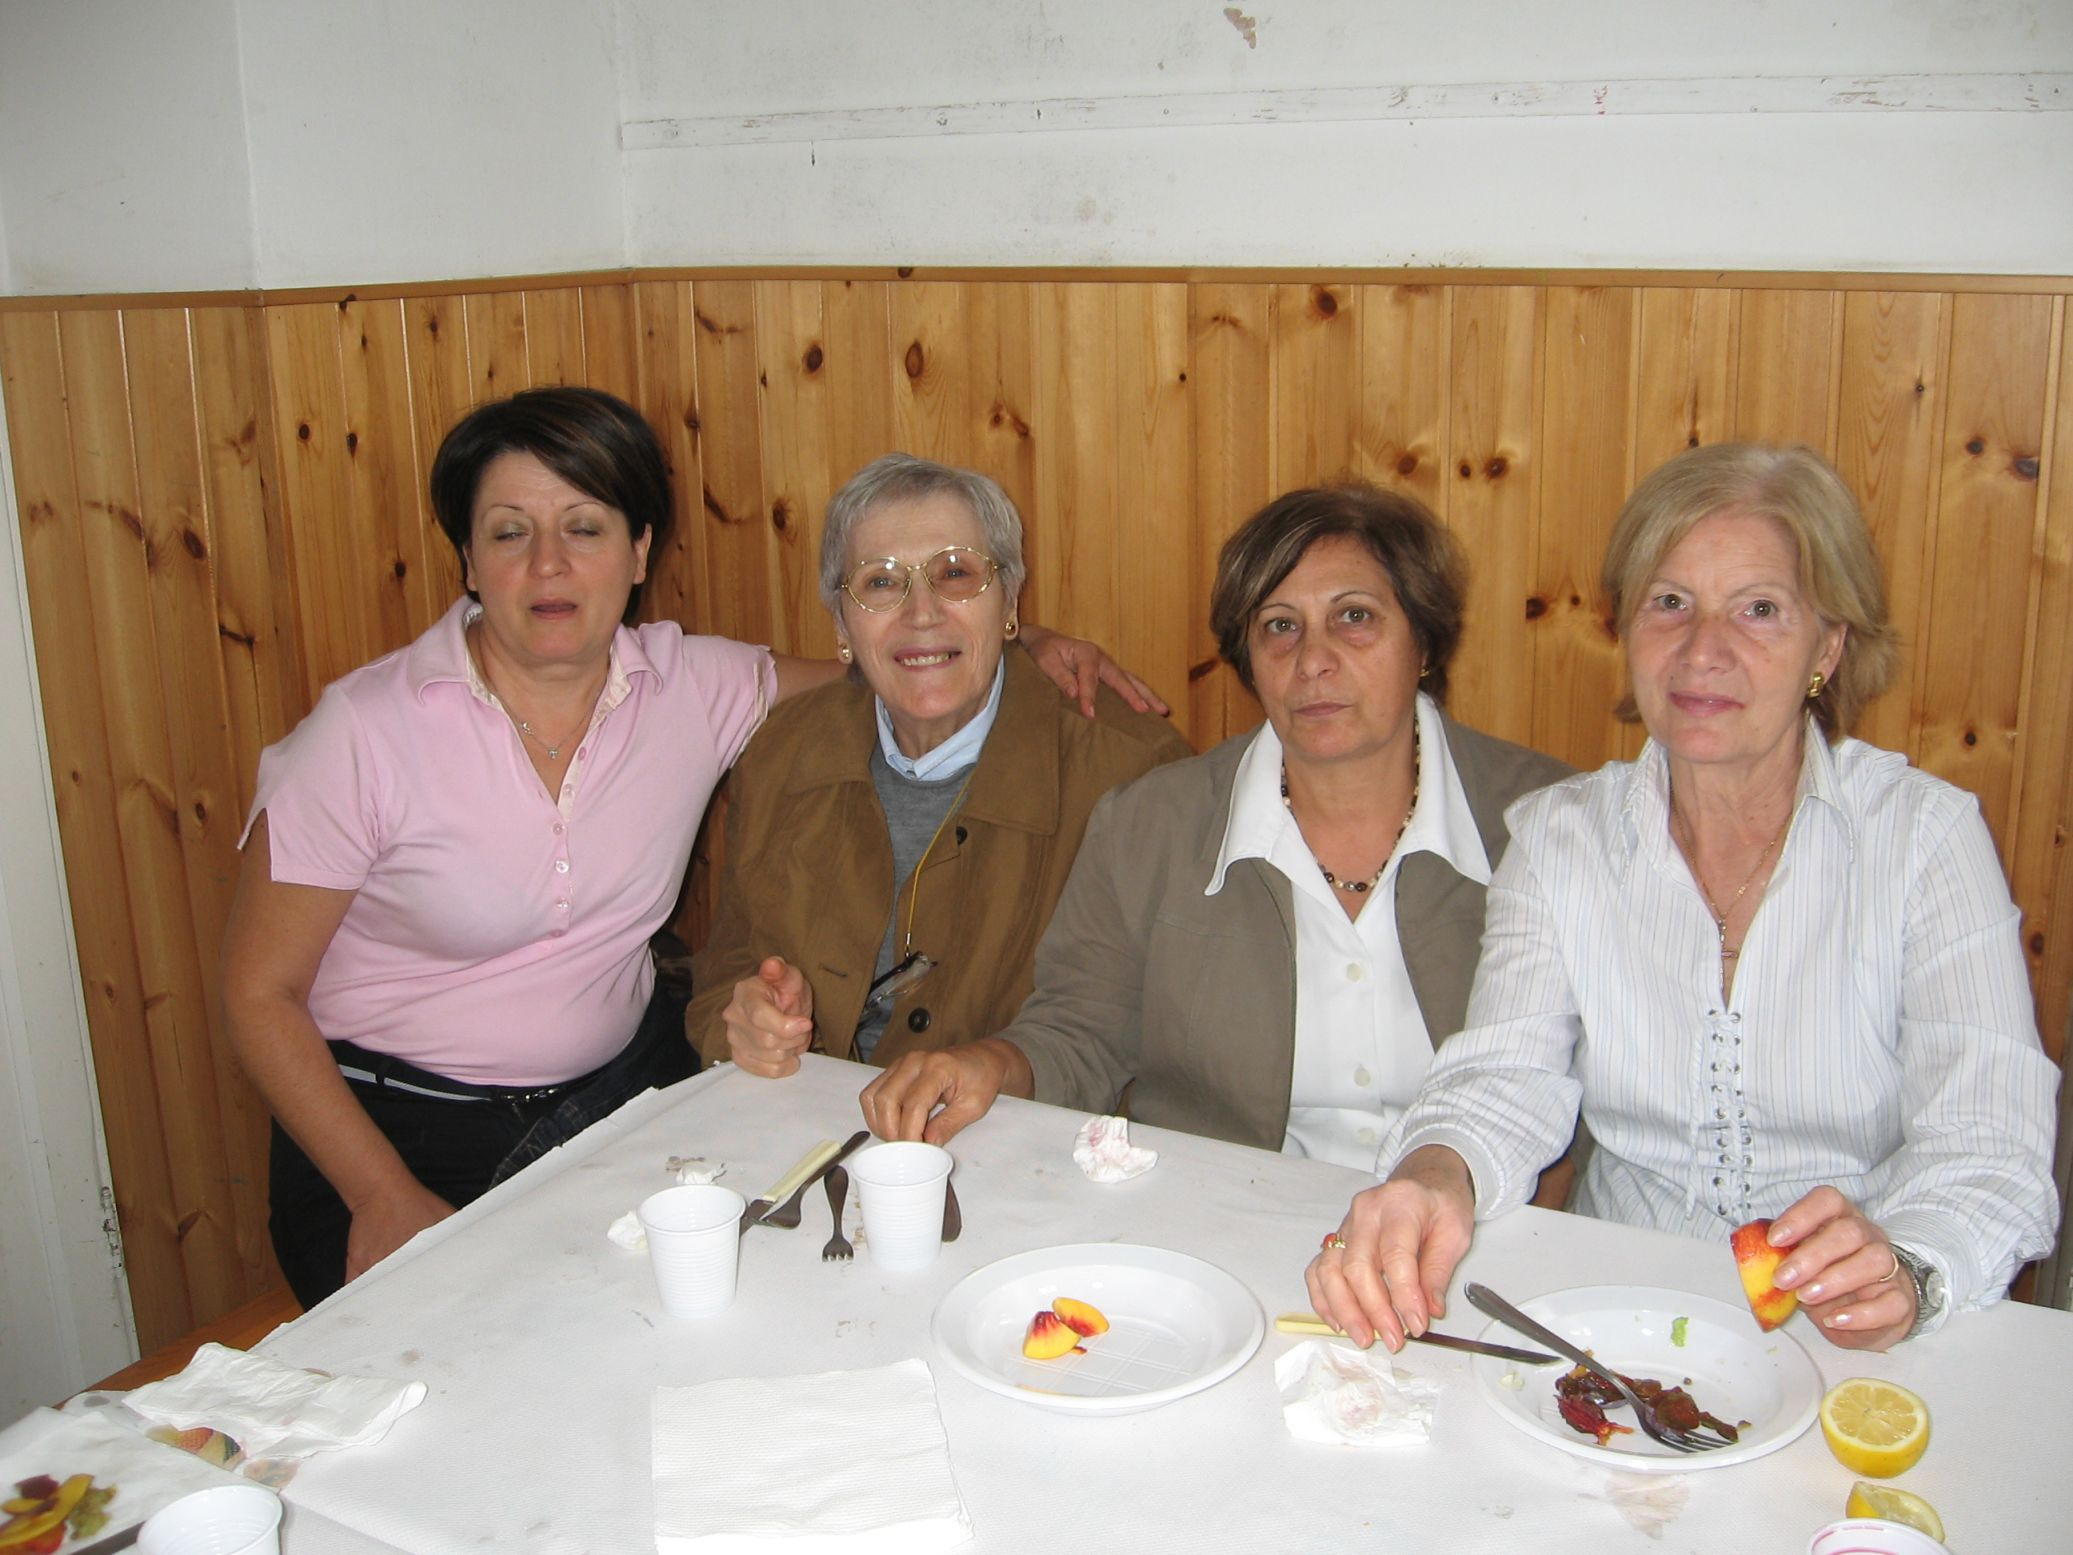 Bivacco_Persone_Impegnate_Torriglia-2009-09-20--14.14.24